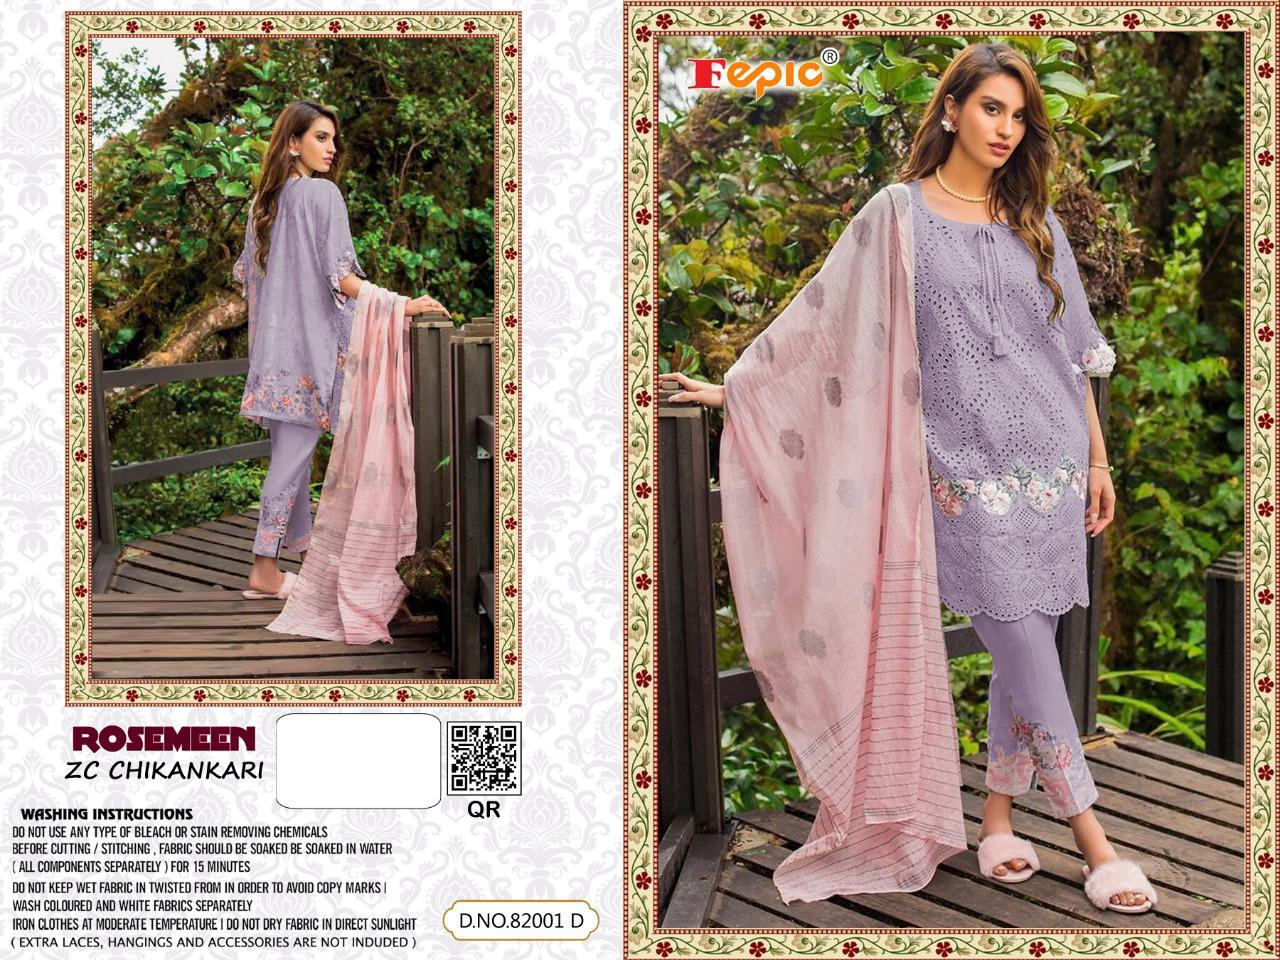 Fepic Rosemeen Chikenkari Designer Pure Cotton Chikenkari Suits Wholesale